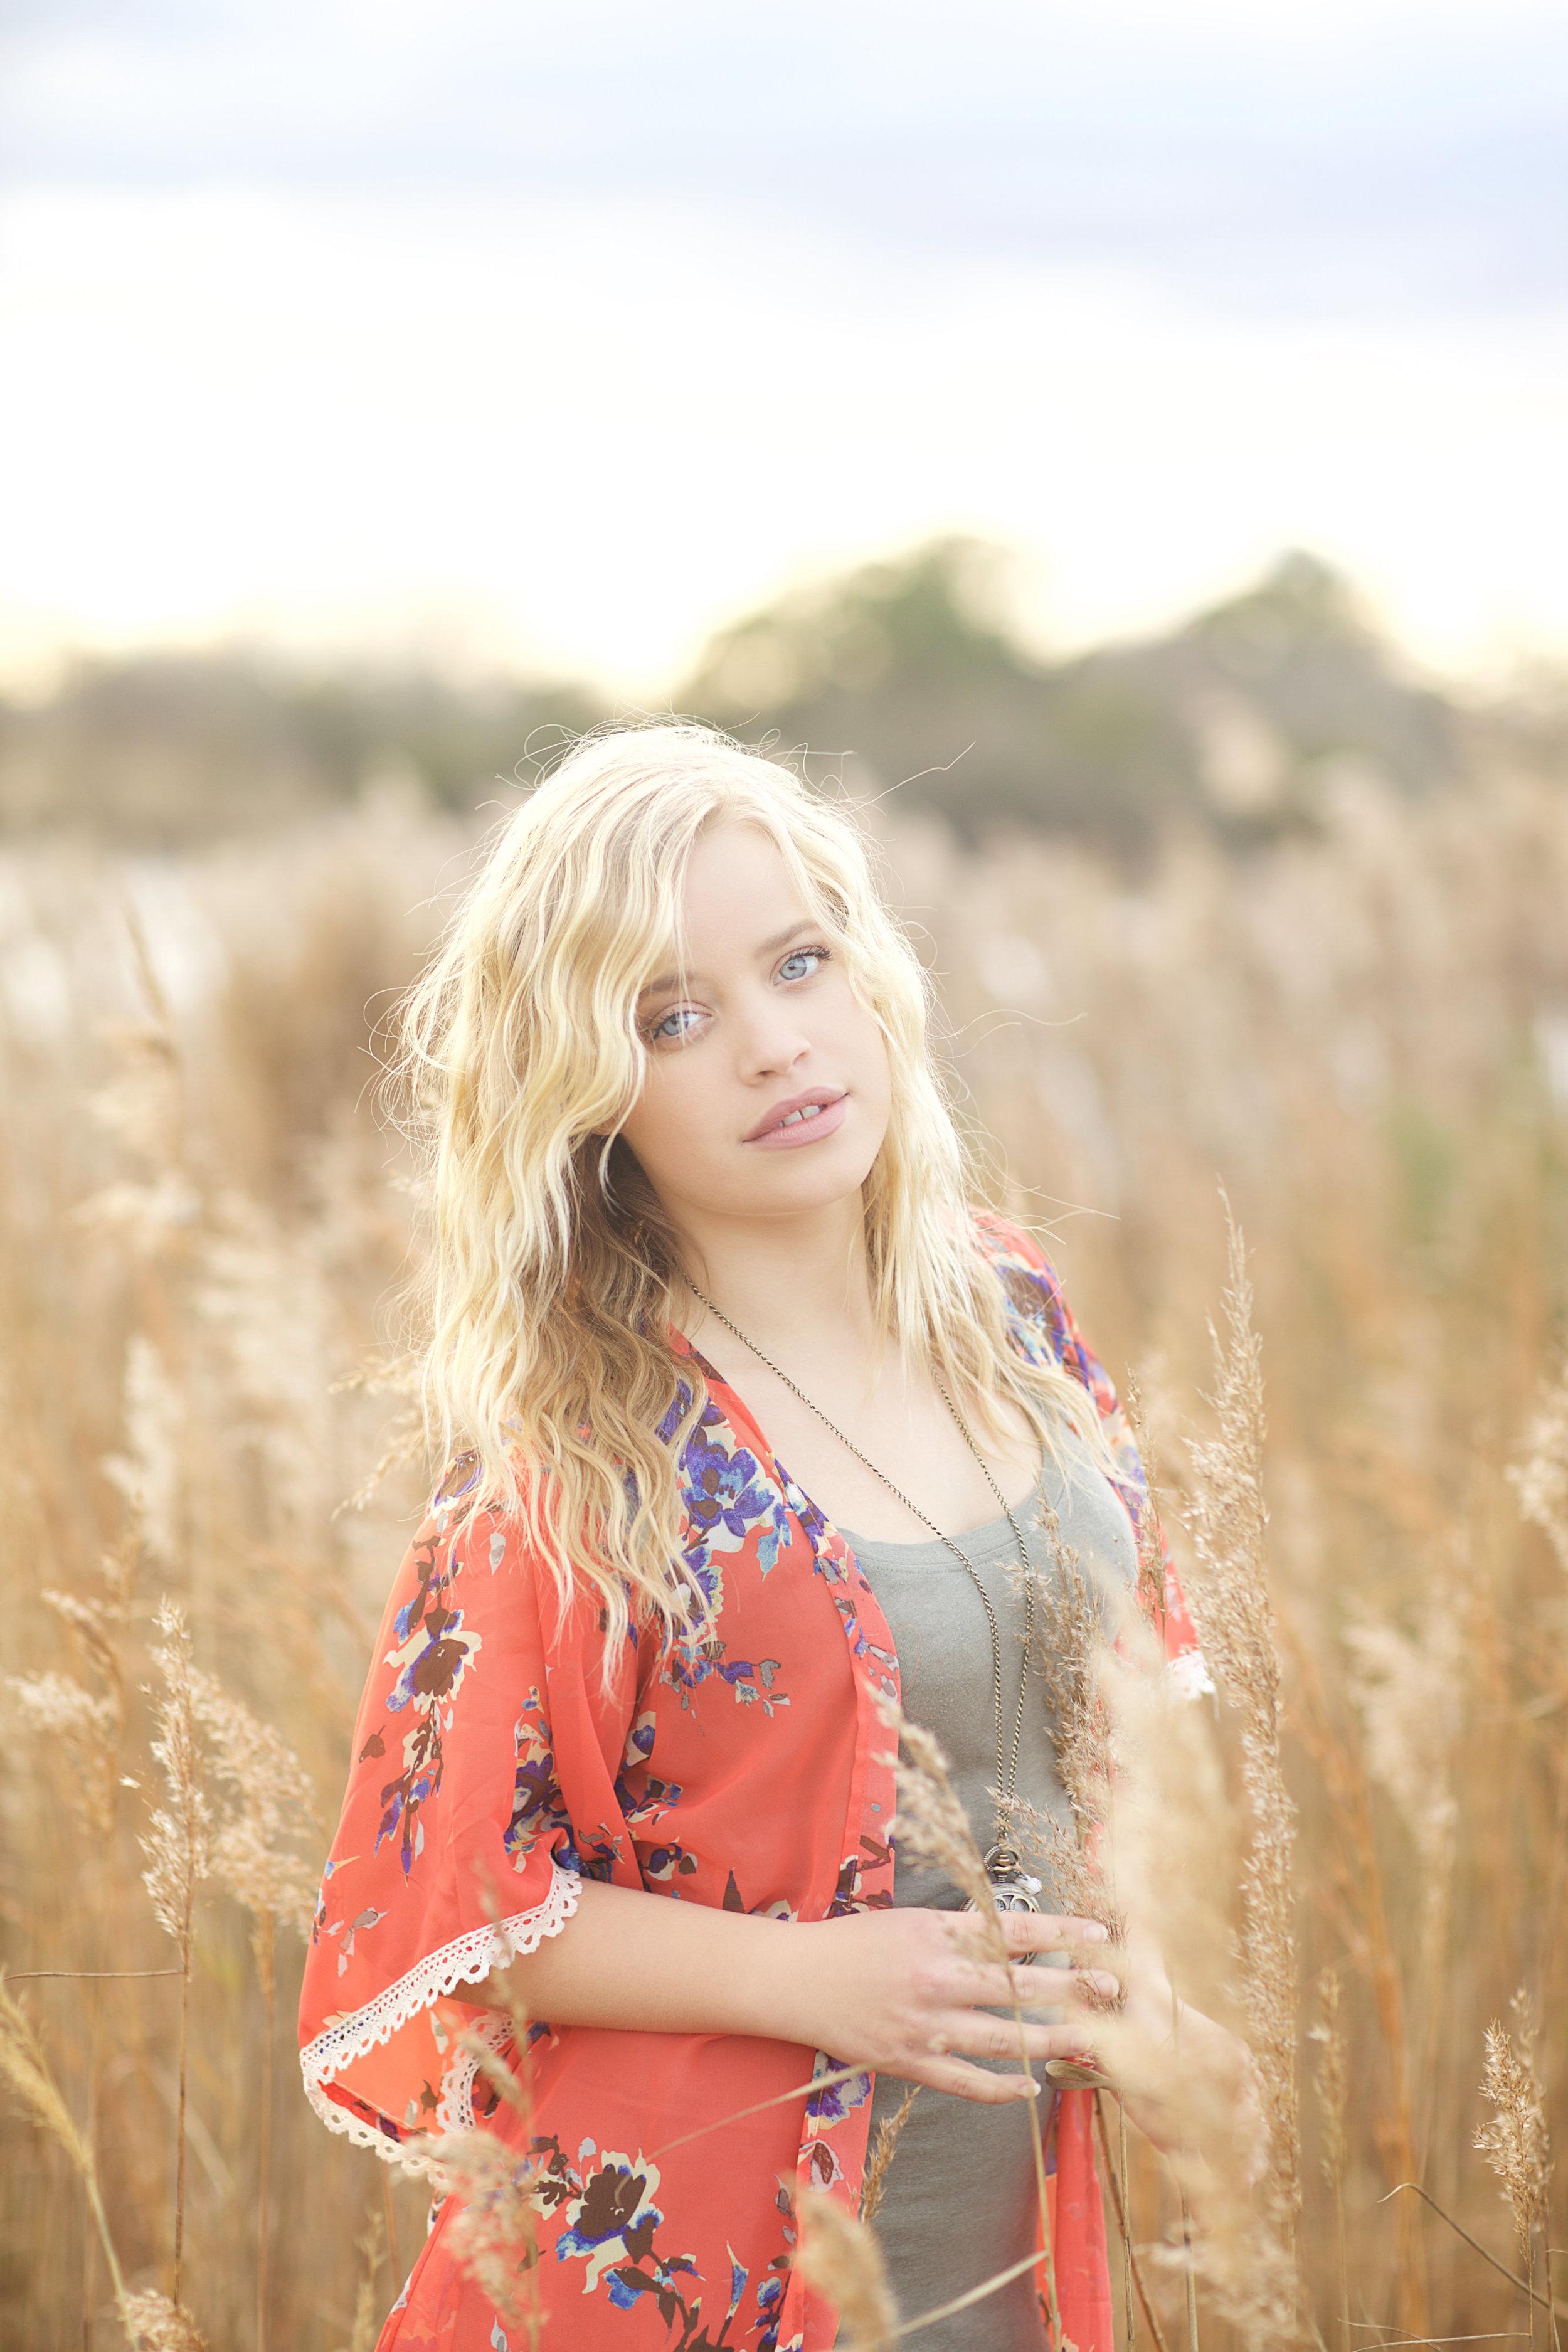 Shelby-Shelby Carter 2014-0009.jpg